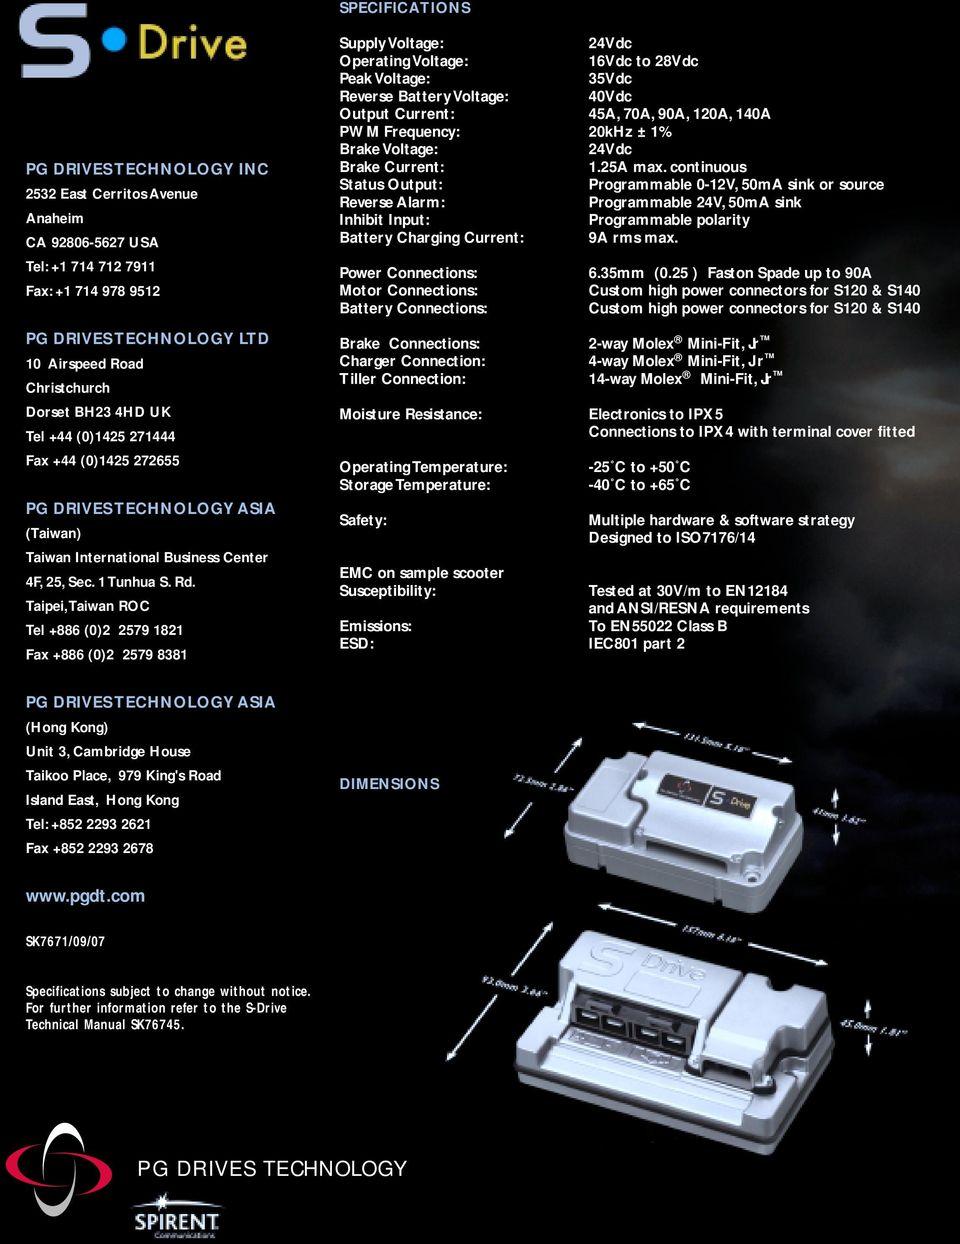 hight resolution of taipei taiwan roc tel 886 0 2 2579 1821 fax 886